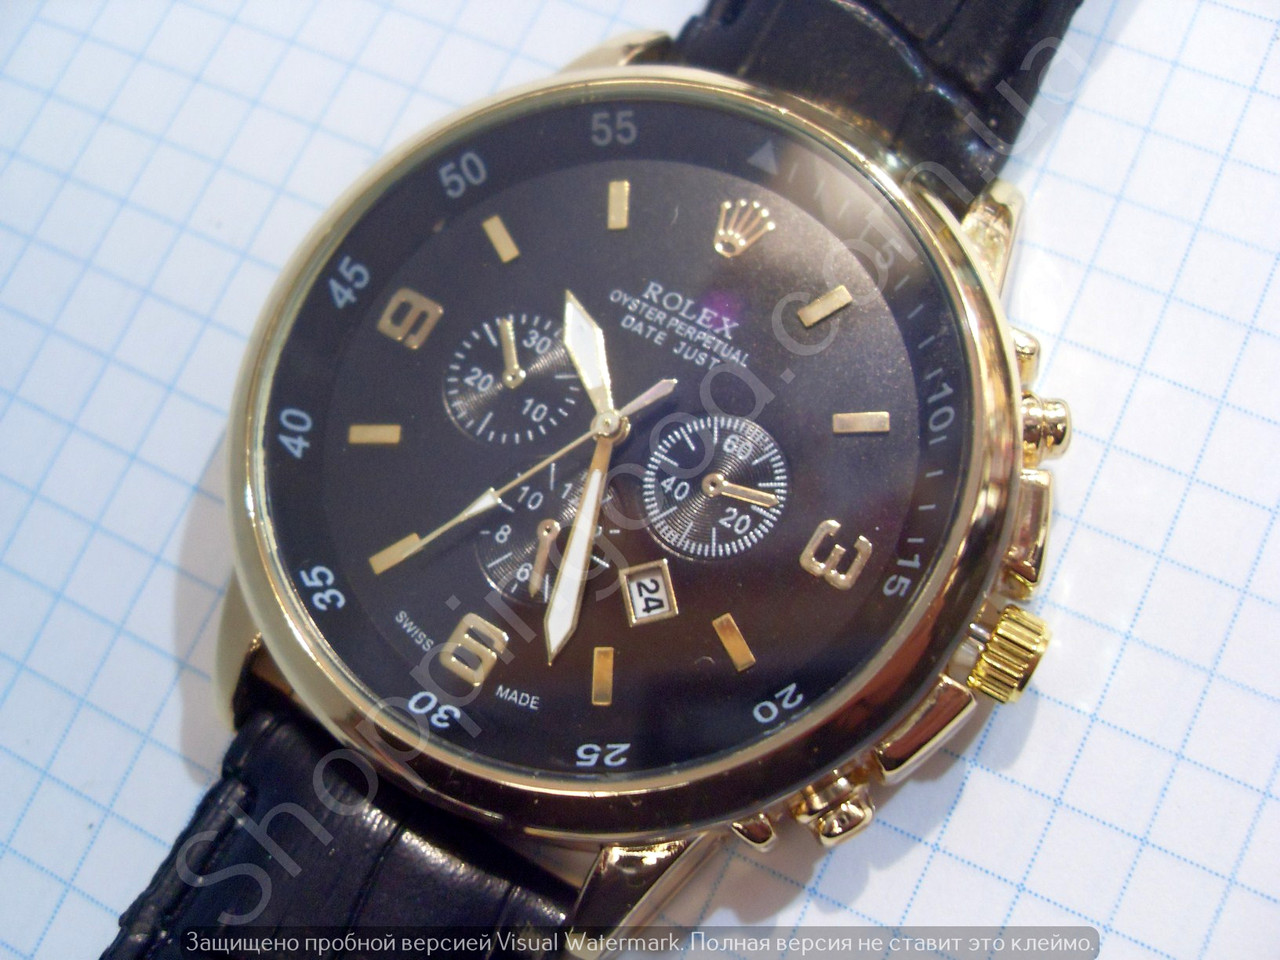 Часы Rolex Oyster Perpetual 6716 мужские золотистые на черном циферблате  кварцевые с календарем диаметр 45 мм aa77d7cb76f